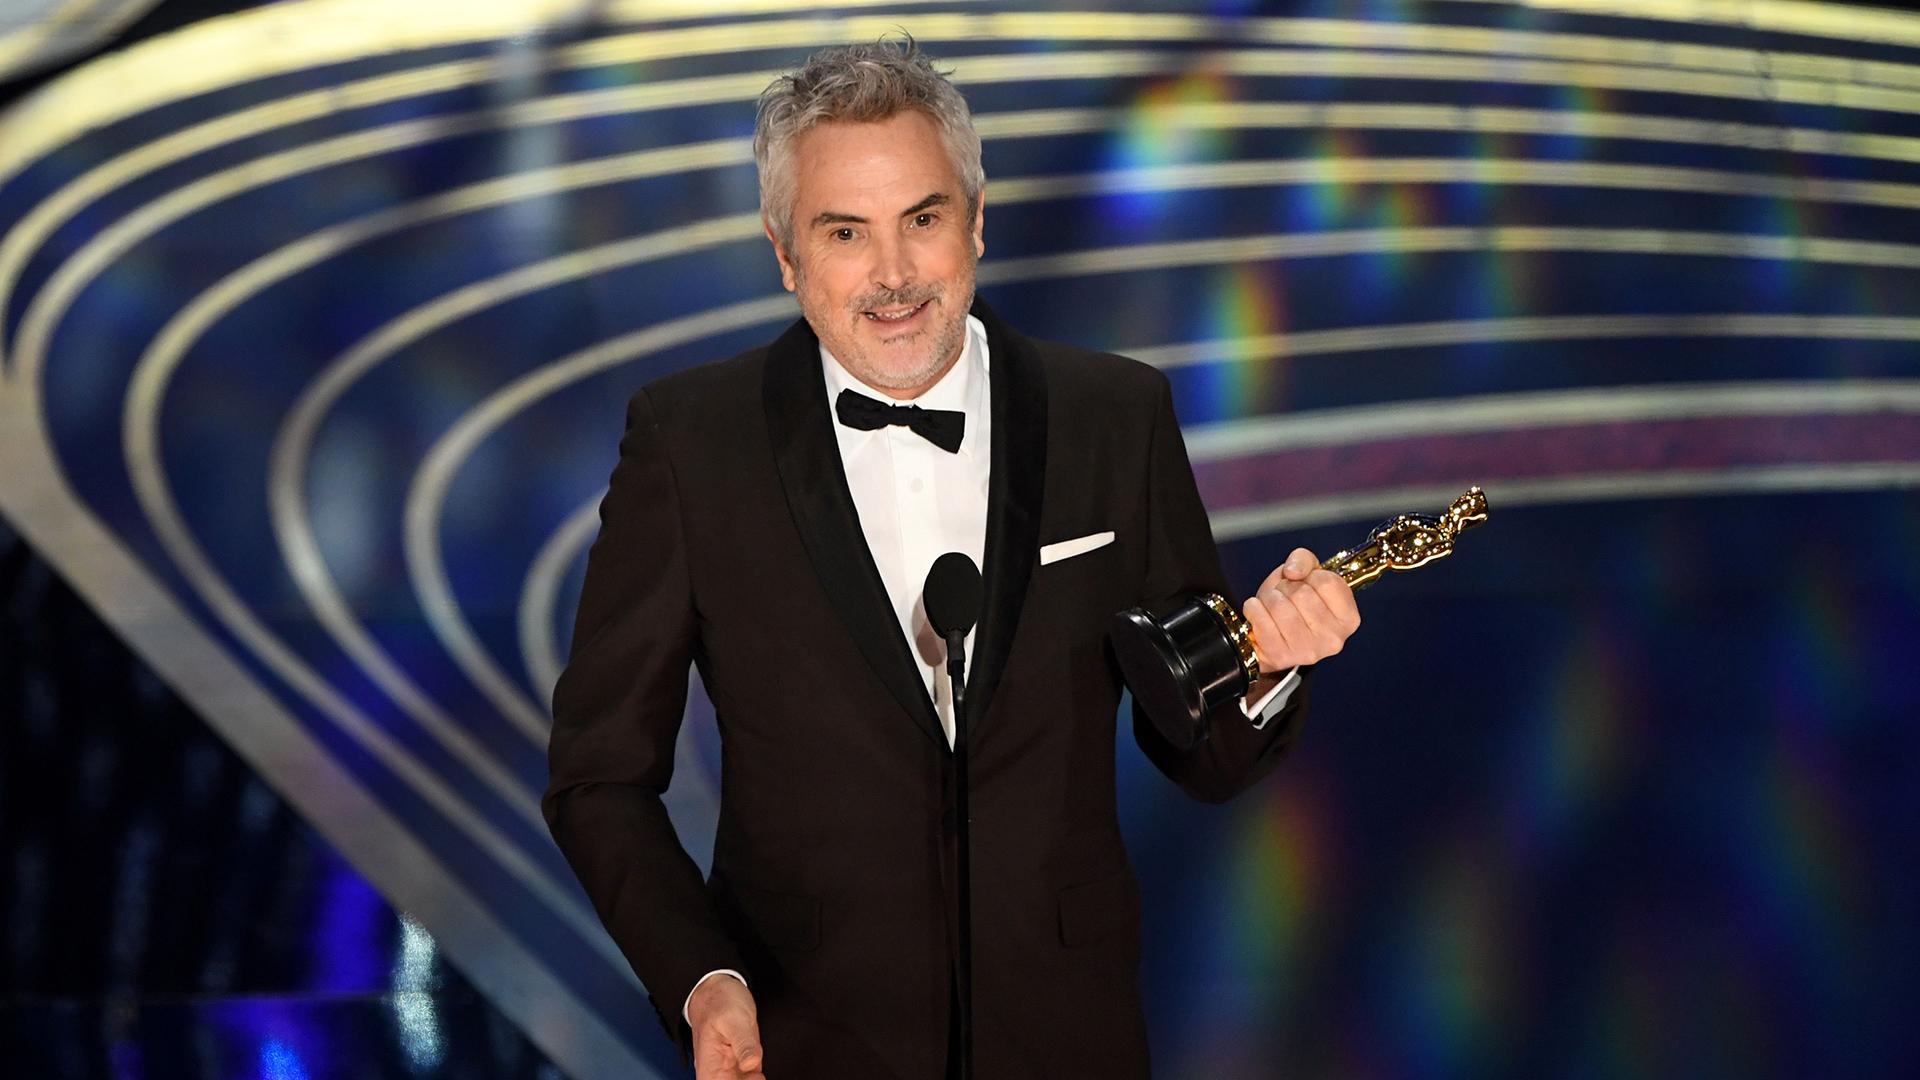 Oscars 2019: The Complete List of Winners | Telemundo